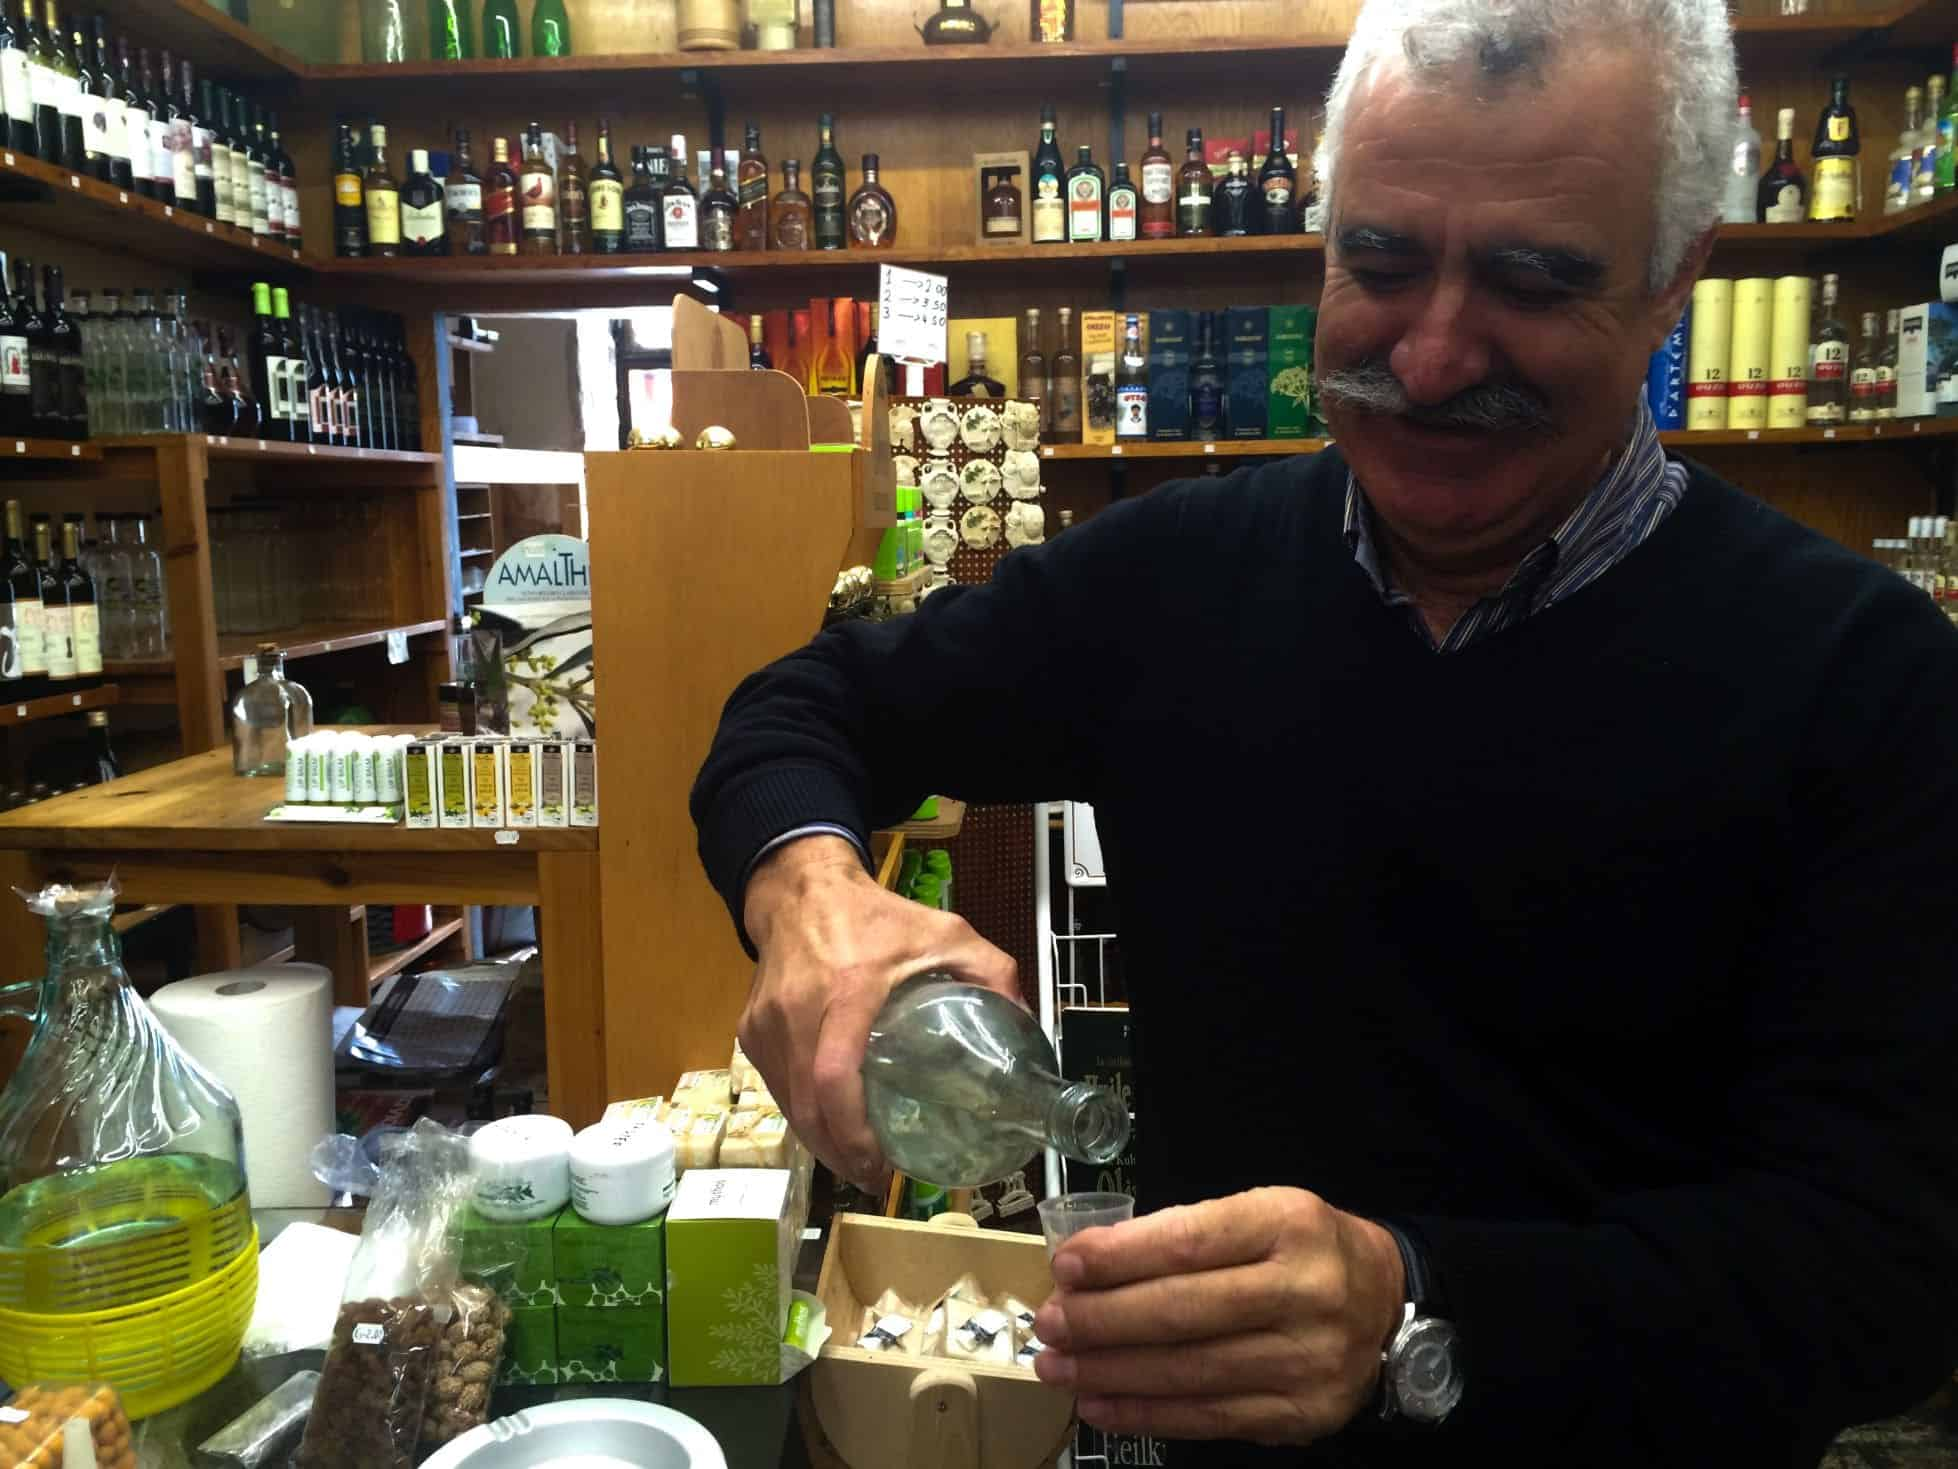 Crete Greece Chania Things To Do Lefteris Raki Chania Market